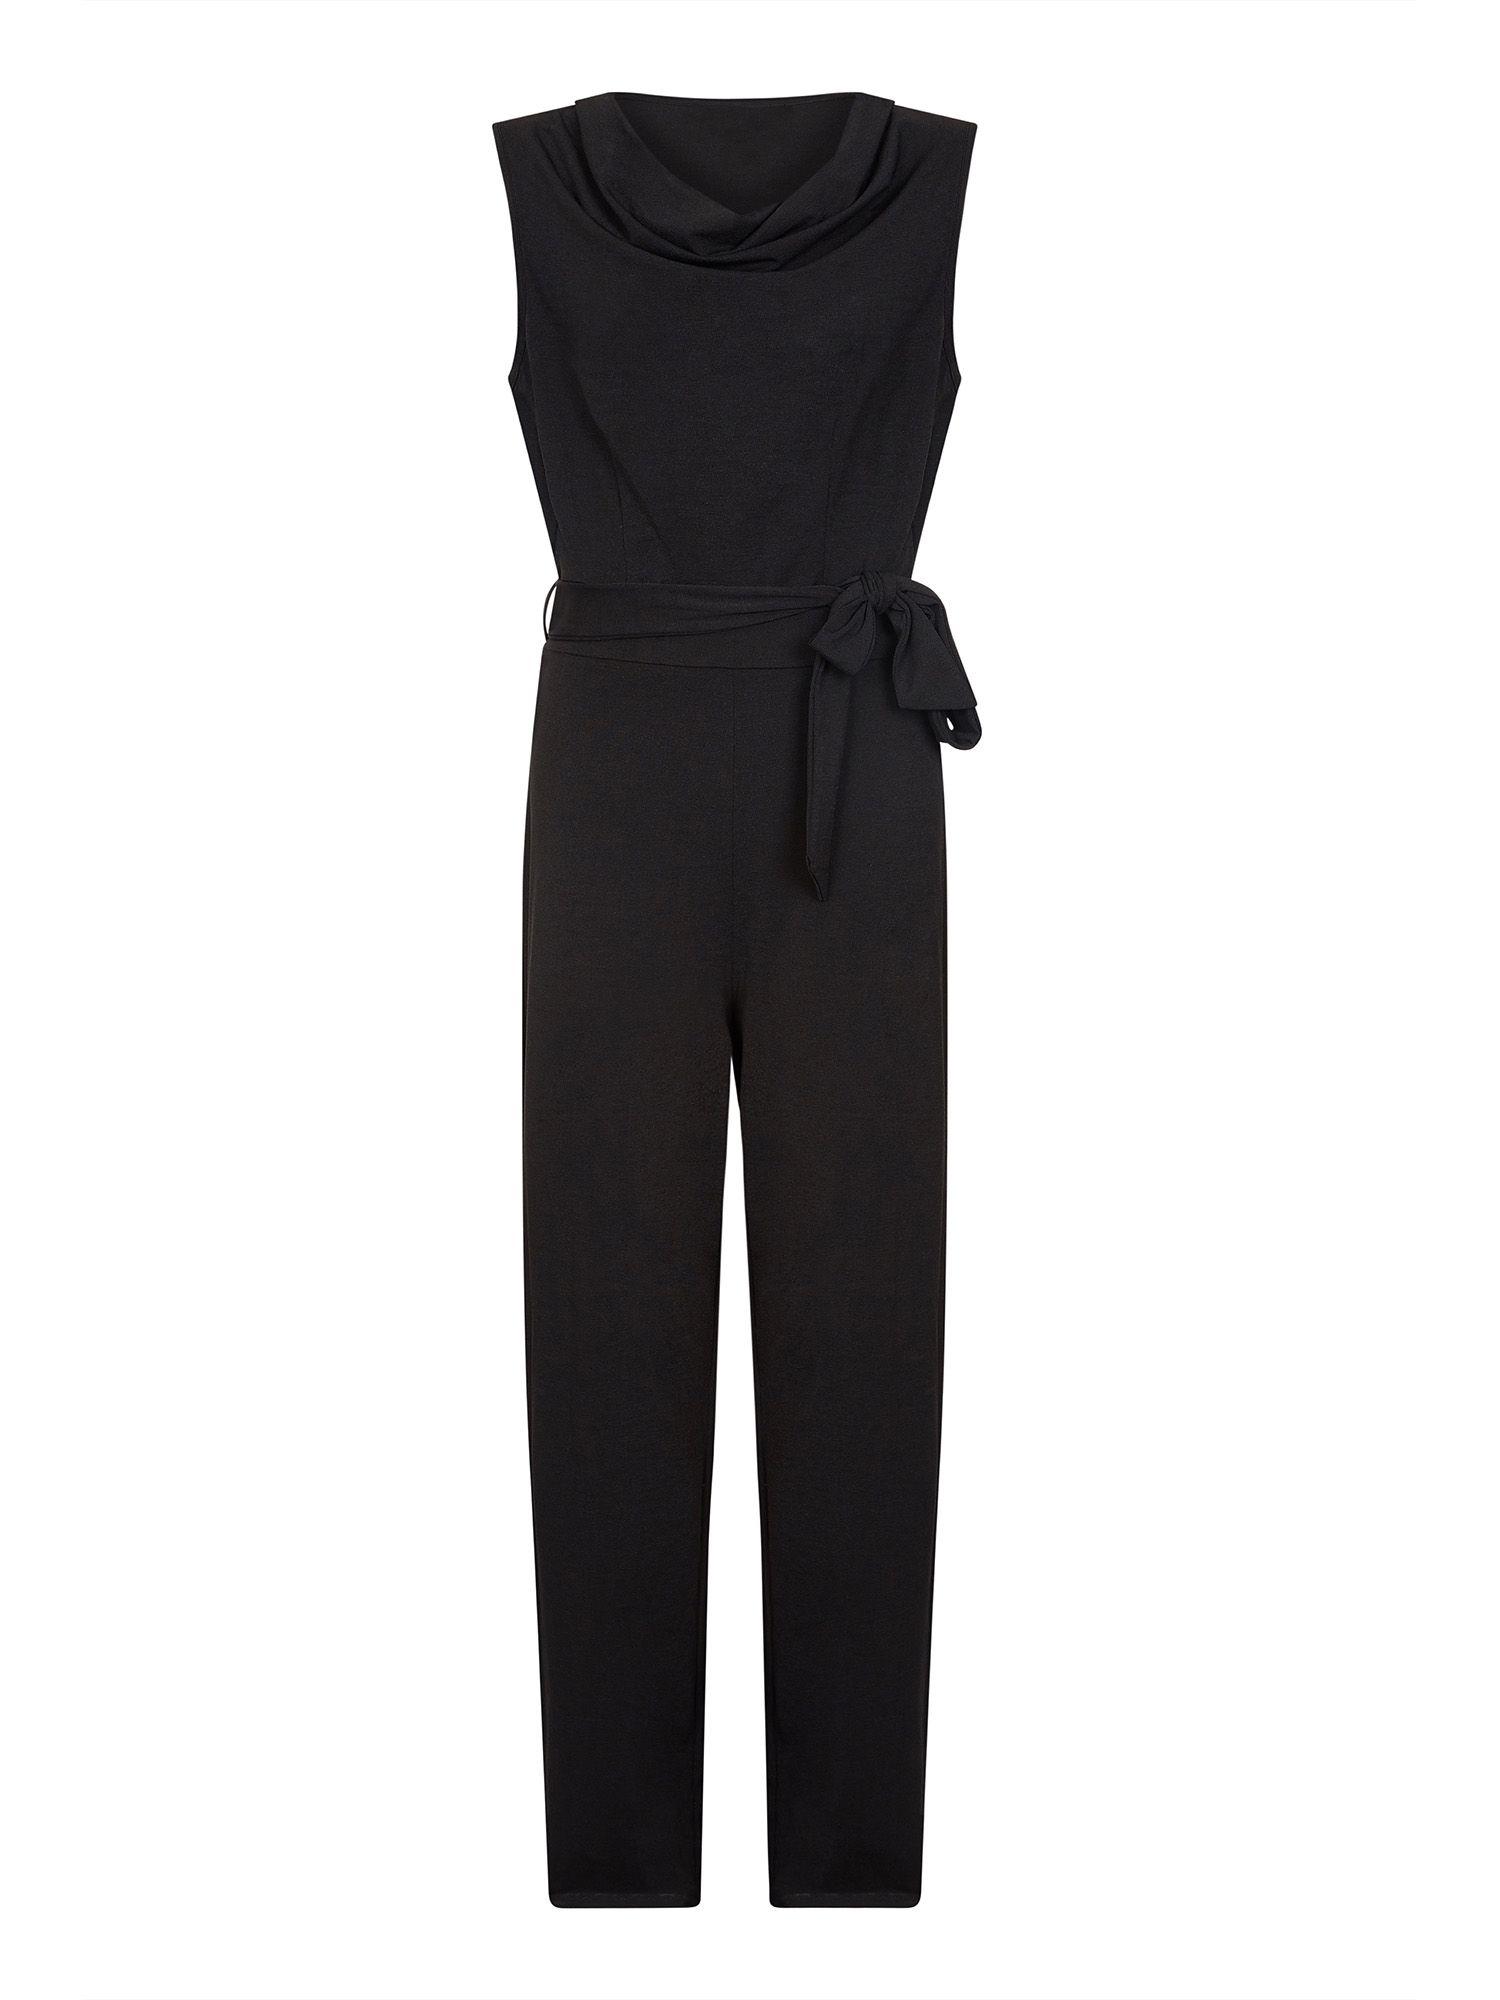 Cowl Neck Sleeveless Jumpsuit